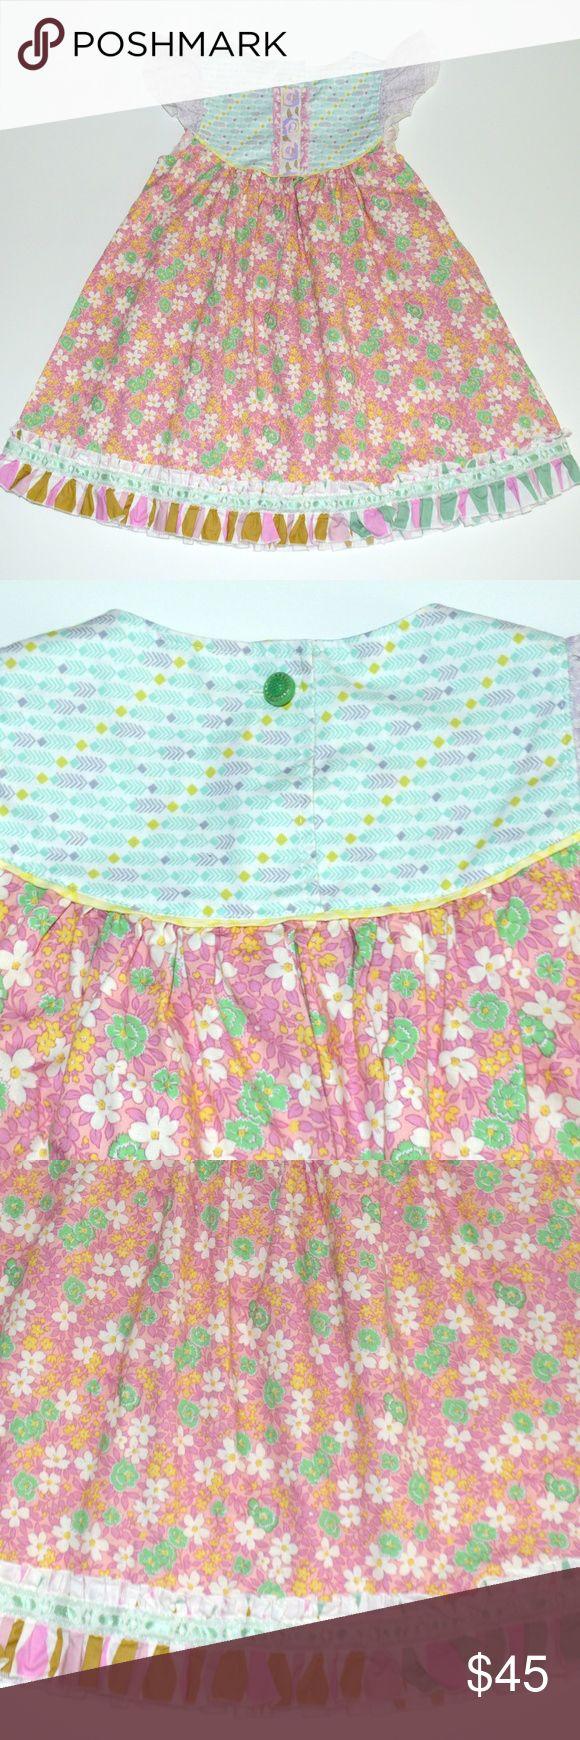 "Matilda Jane Platinum 4 Bonnie Flutter Dress Lavender Pink Mint Floral  Excellent condition 100% cotton Seam to seam across chest:  12.5"" Top of shoulder to bottom (length): 21.5""  (approx) Matilda Jane Dresses Casual"